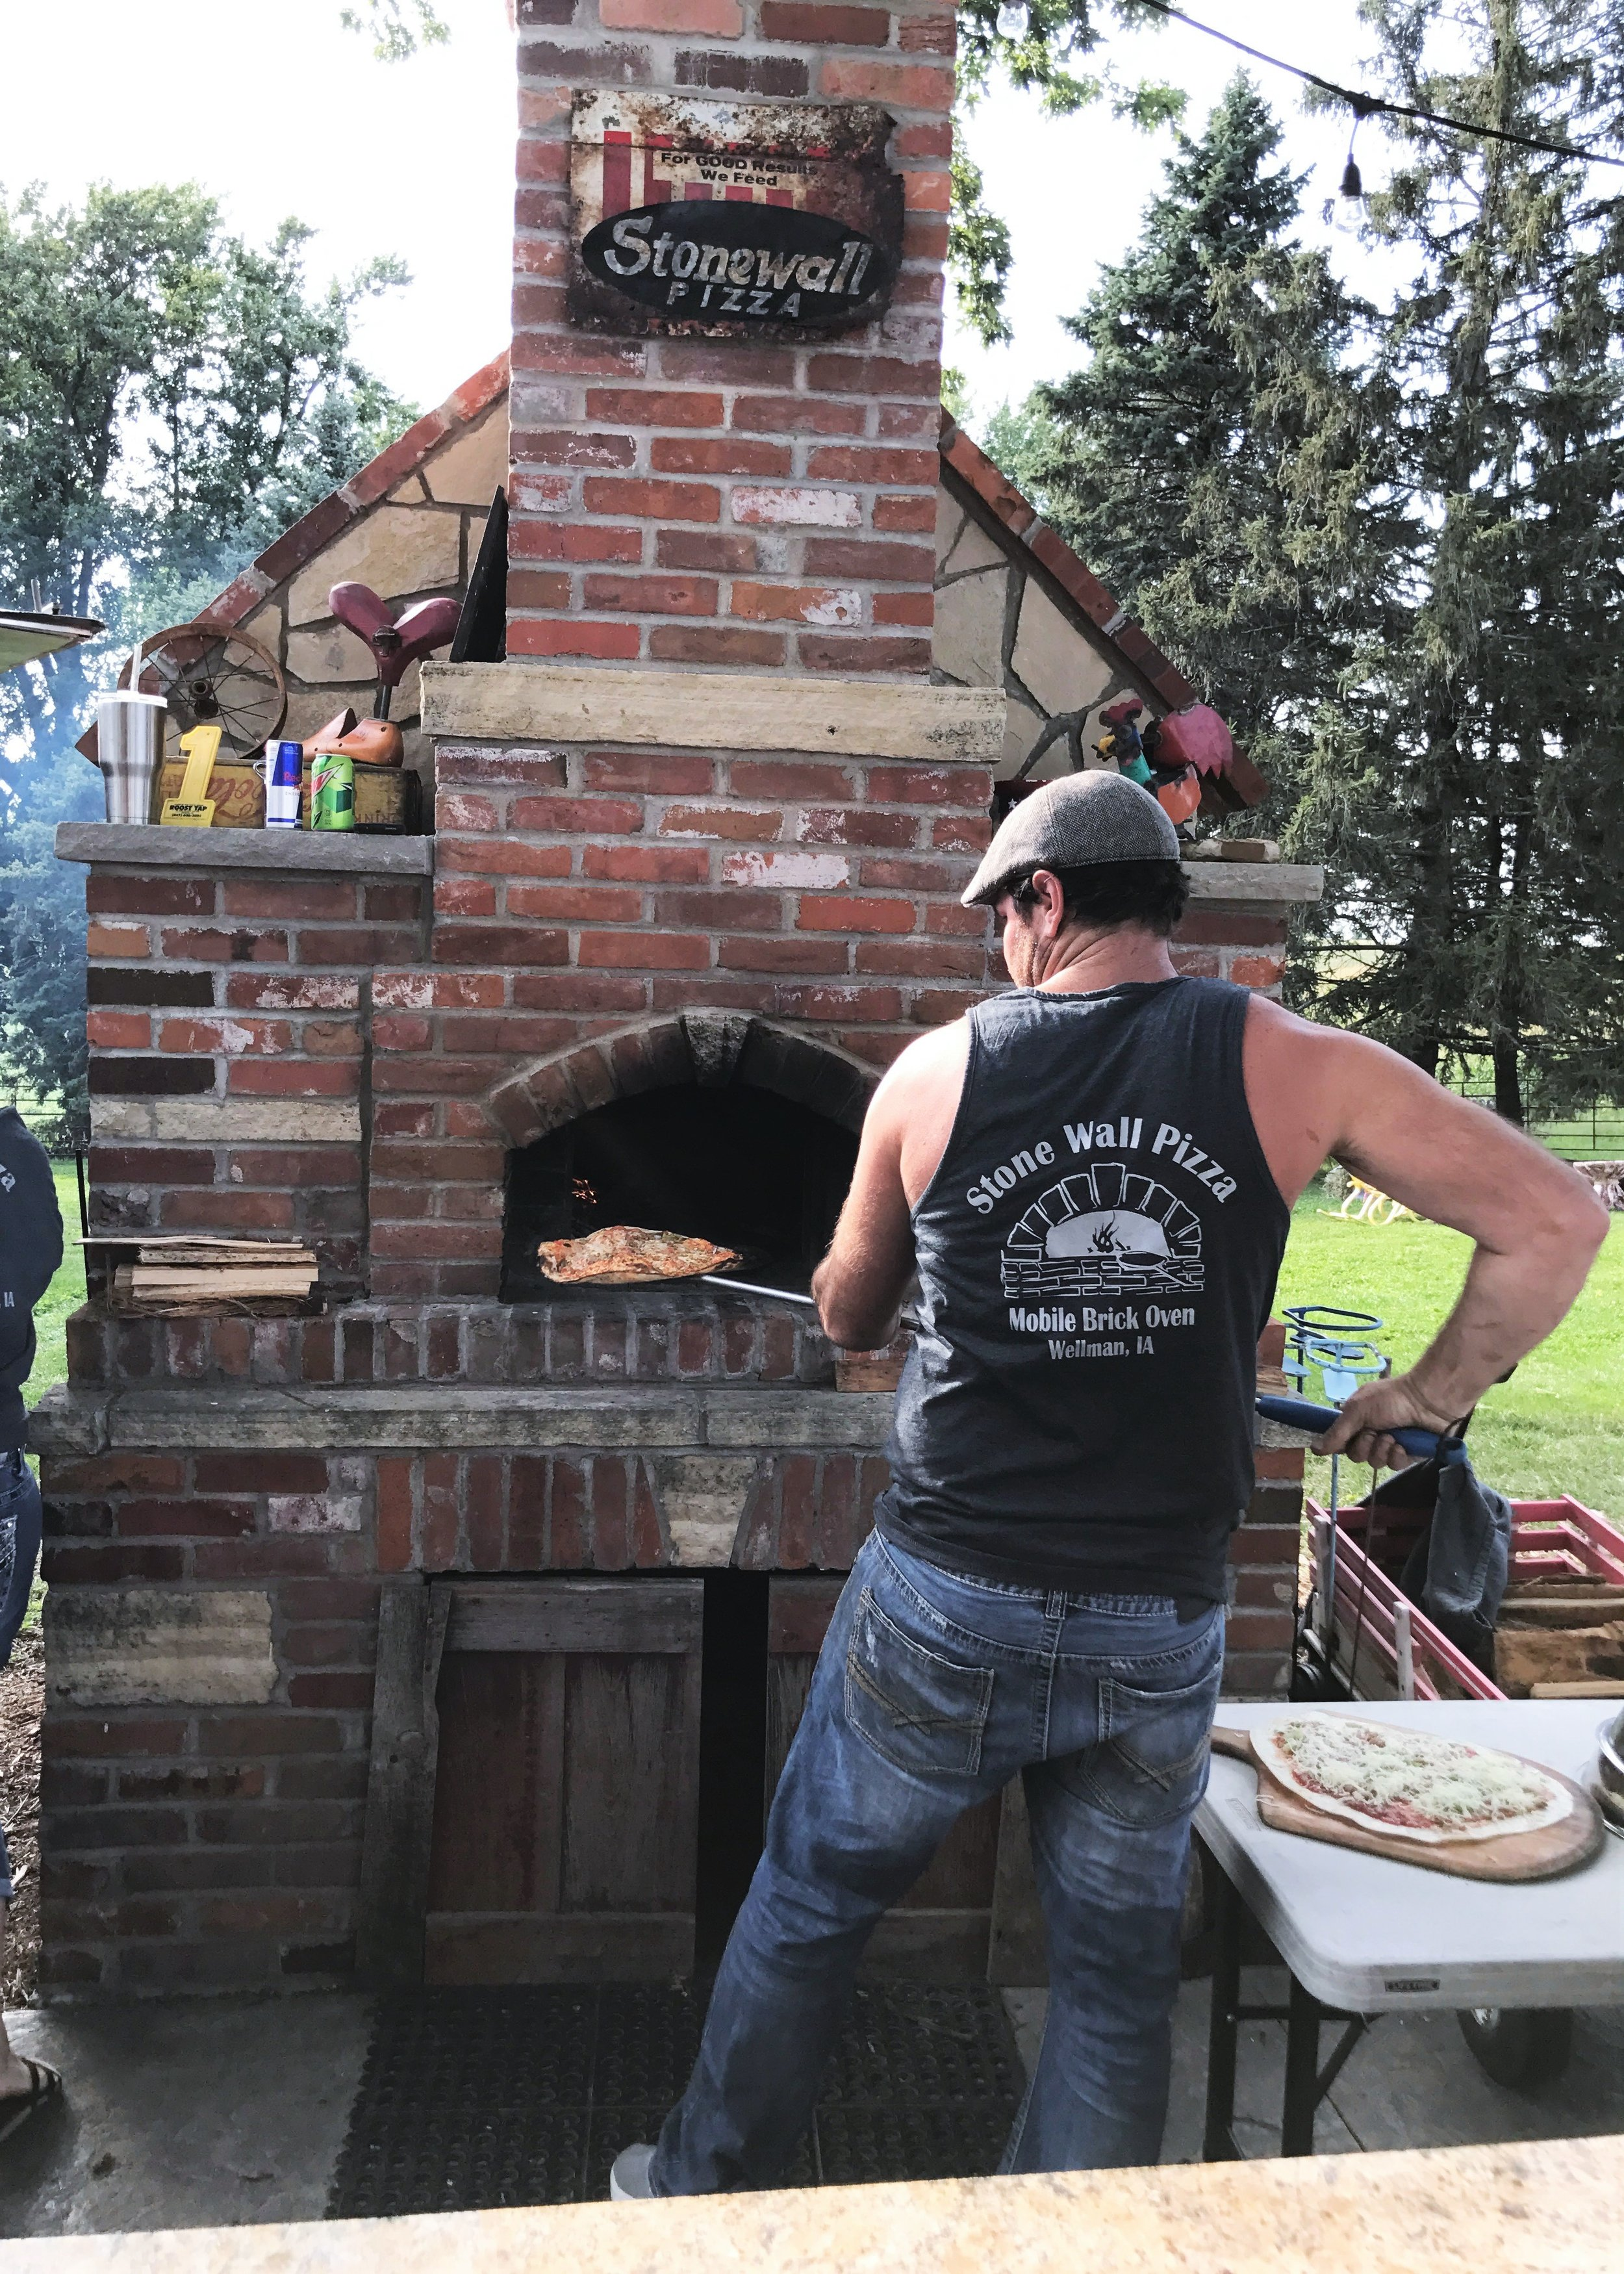 Stone Wall Pizza serves up homemade brick-oven pizza. Photo credit: Anita McVey